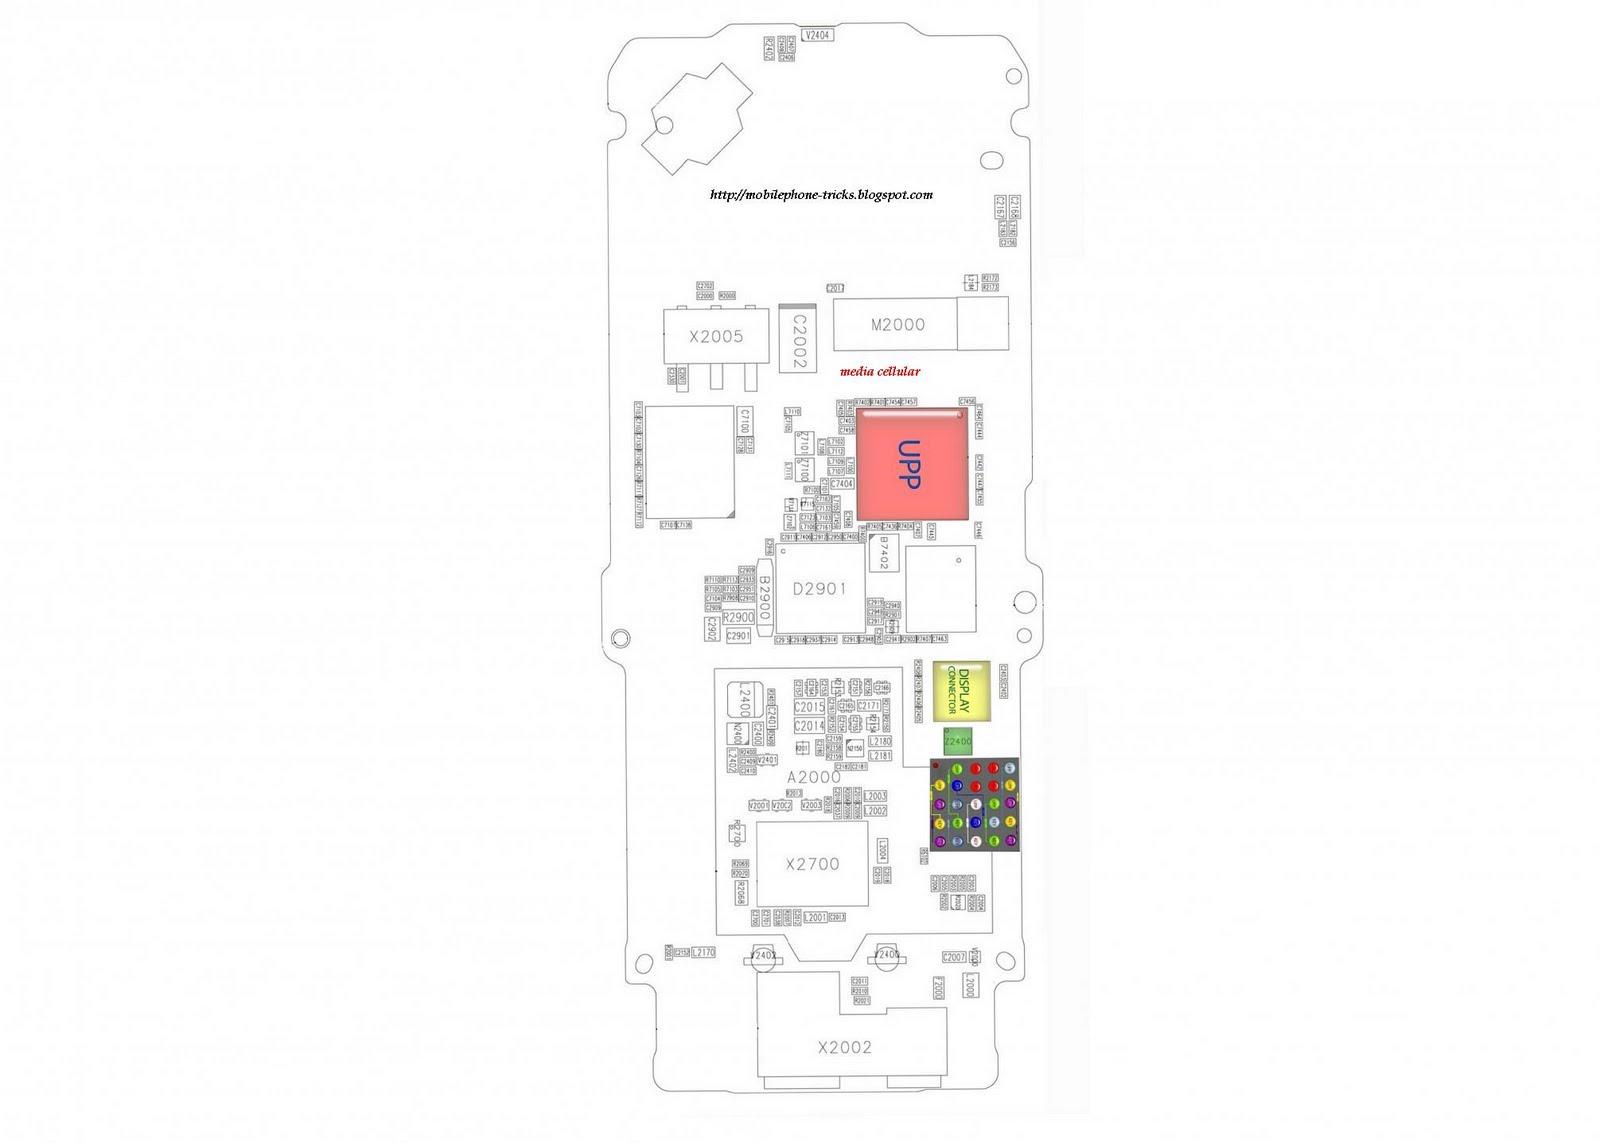 MOBILE PHONE TIPS & TRICKS: Nokia 1200/1208 Keypad Jumper